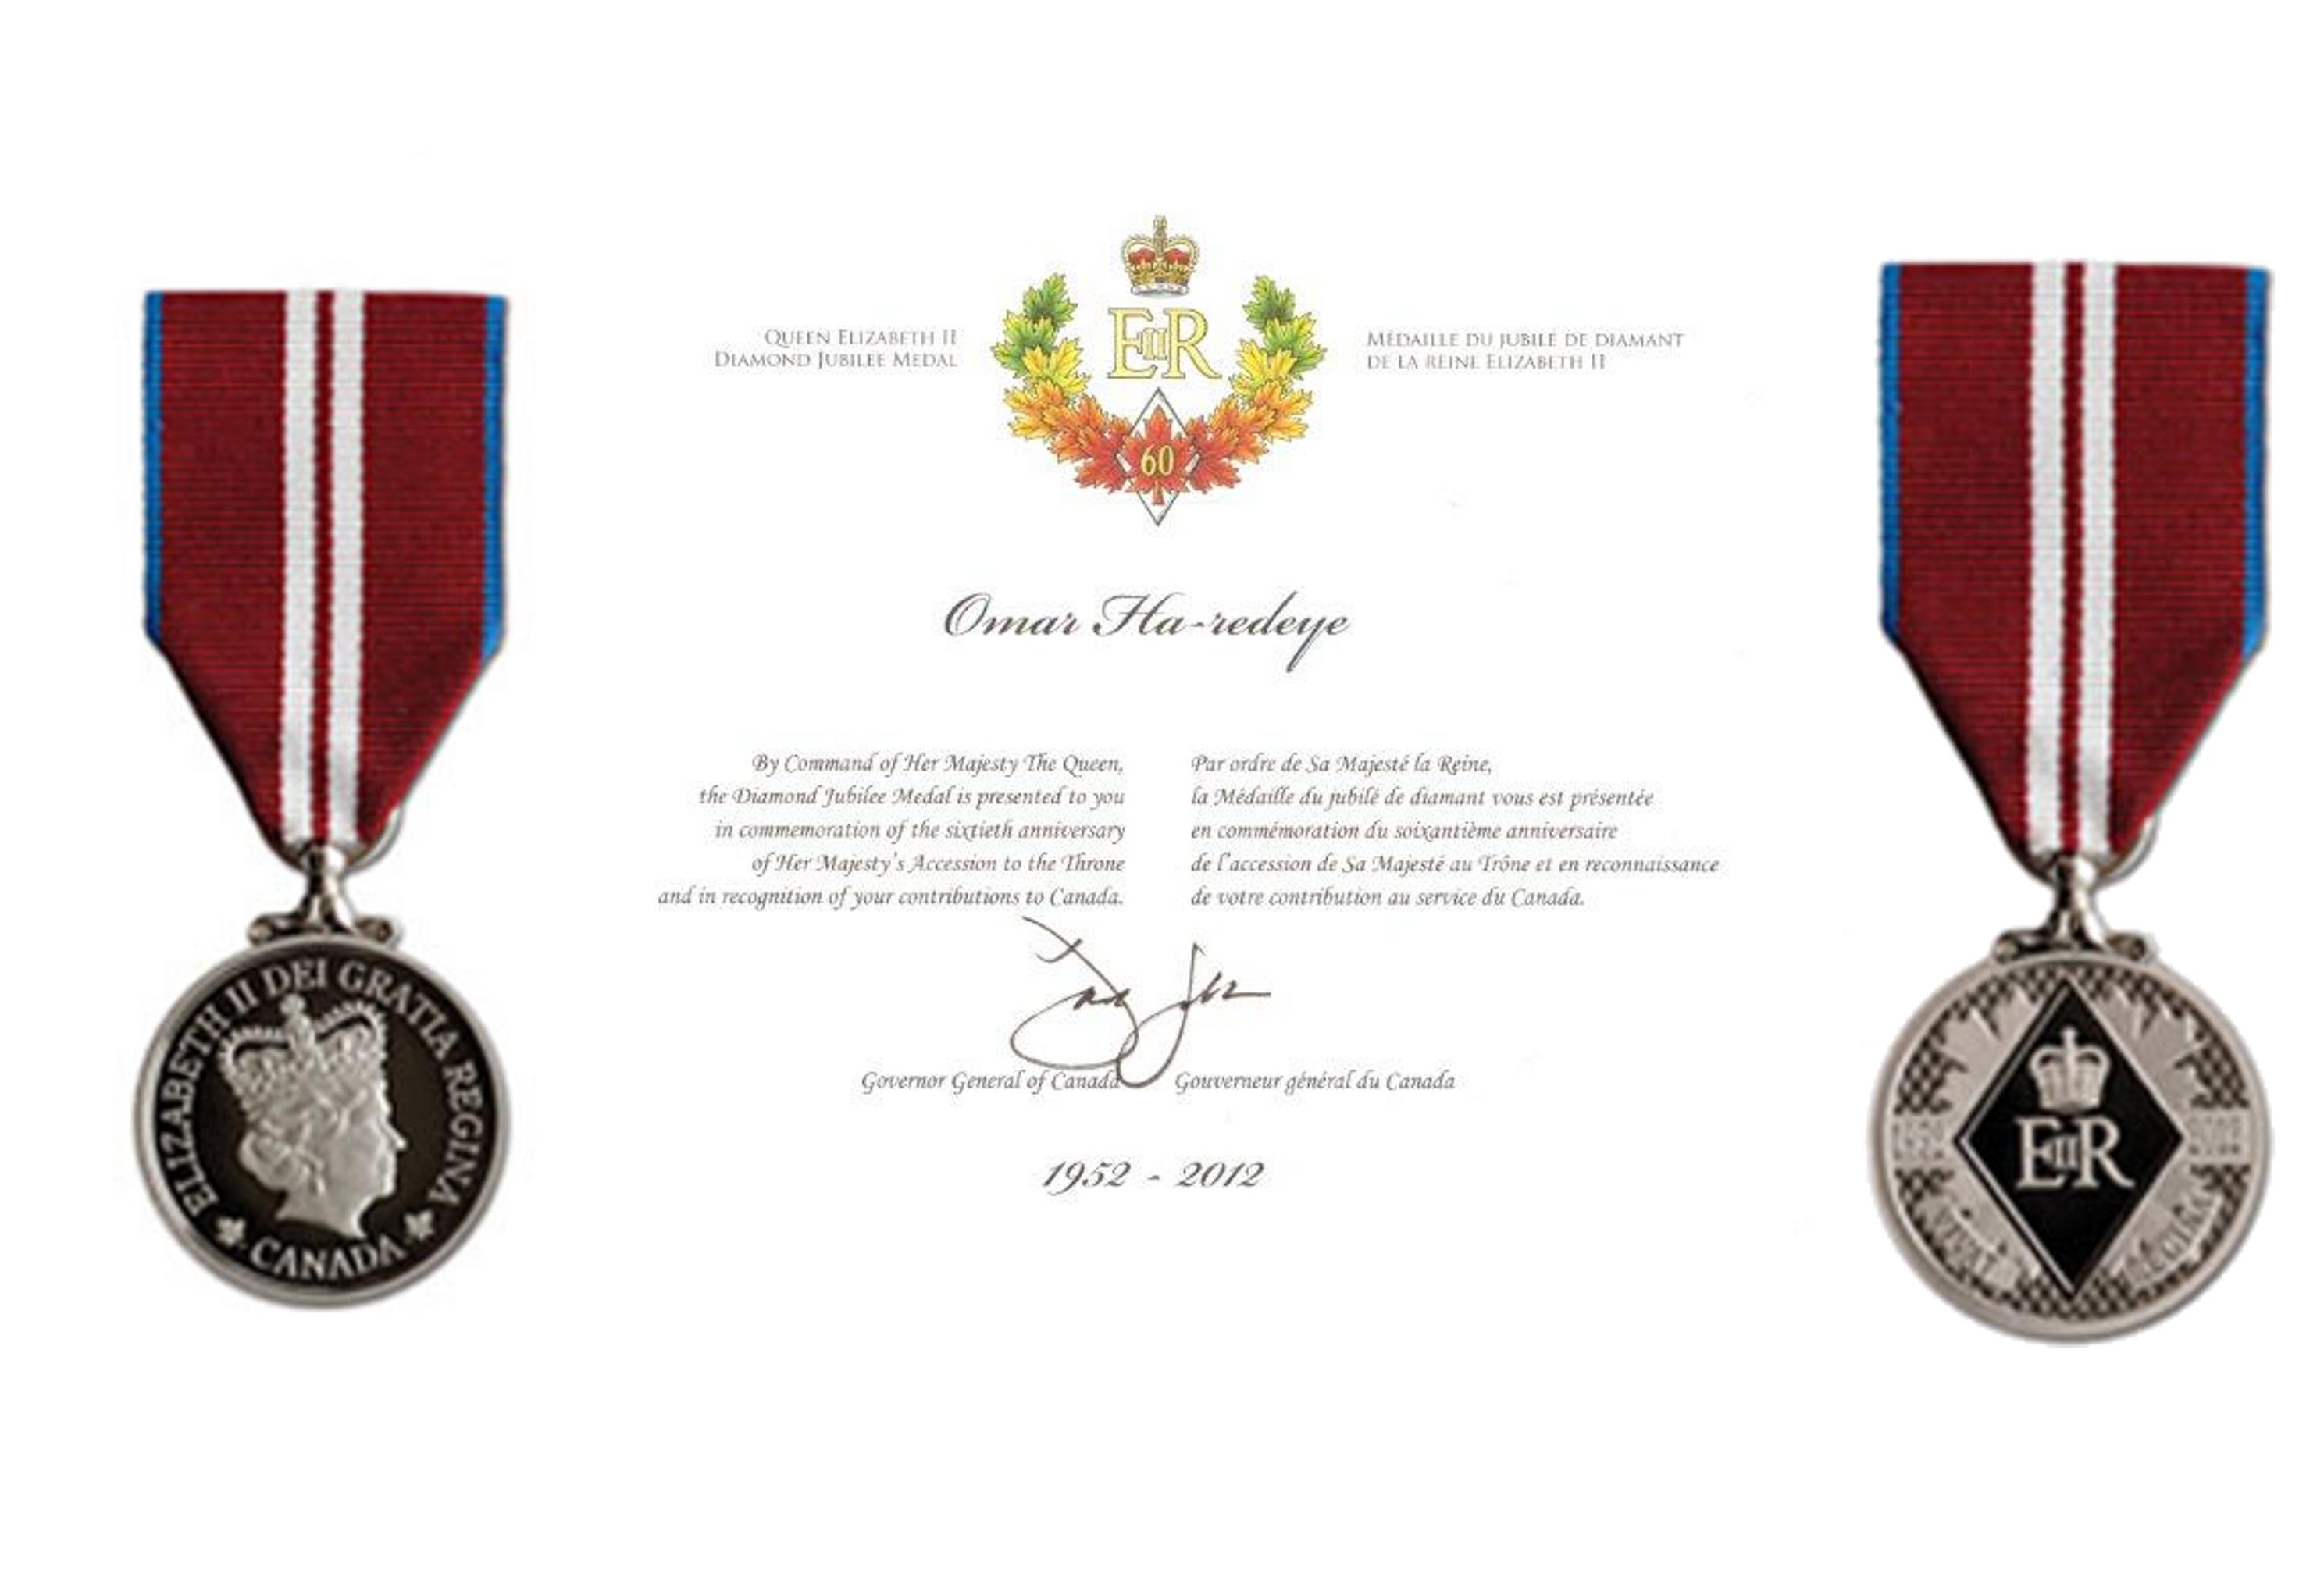 Diamond Jubilee Medal certificate